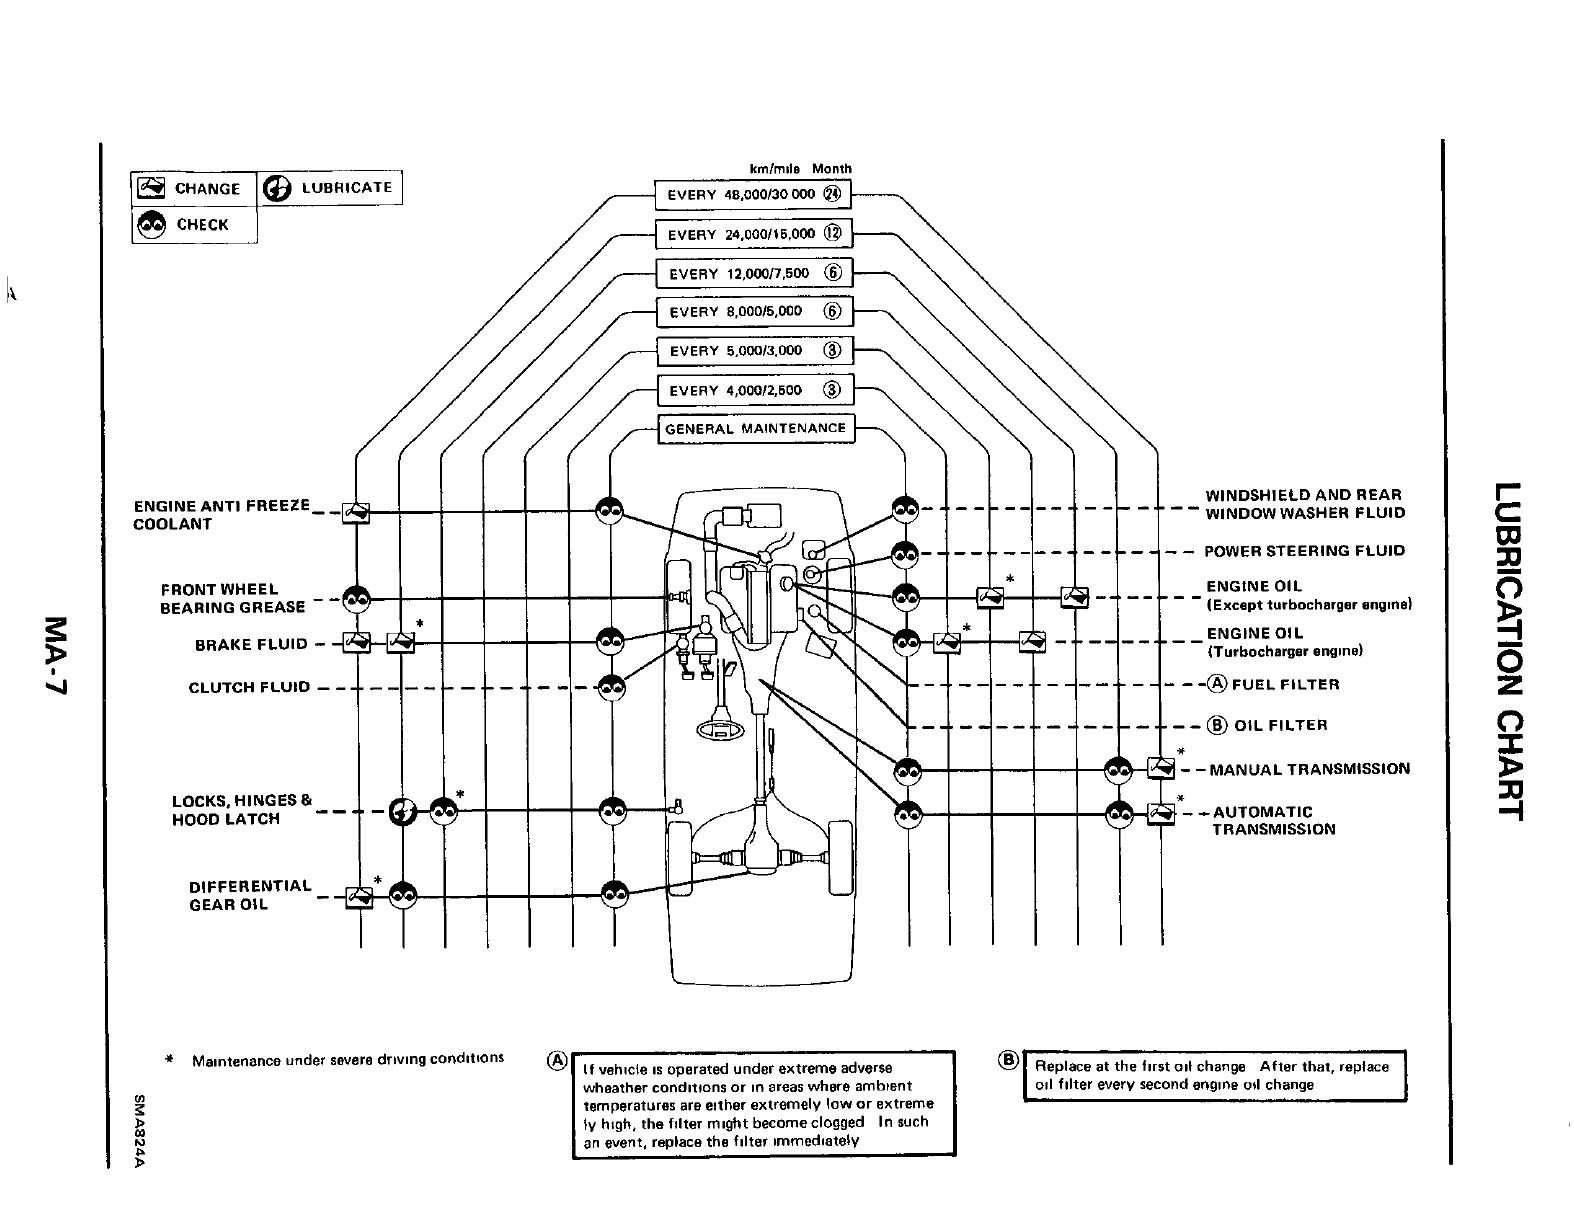 1984 Nissan 300zx Ma Fuel Filter For Secondary Kmlmils